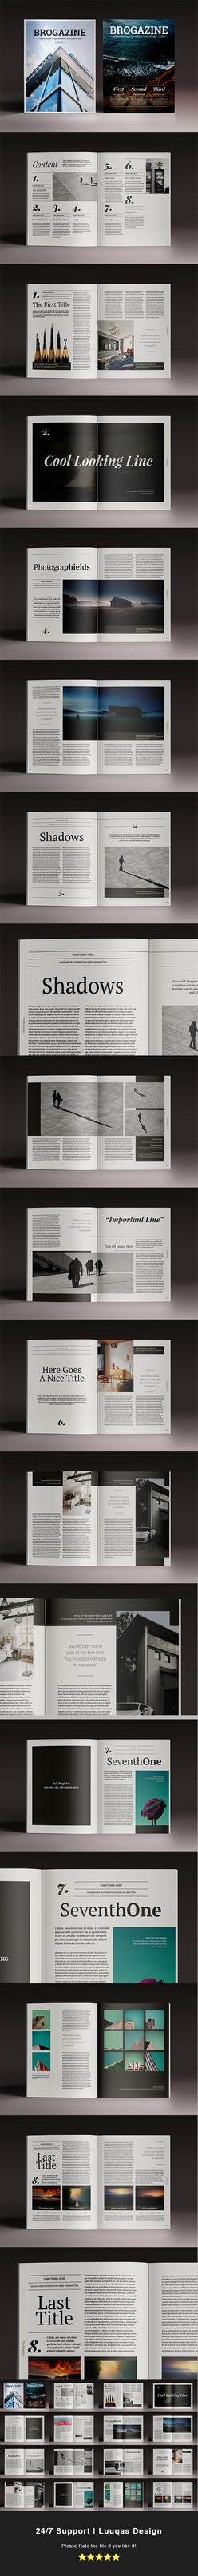 Brogazine Indesign Template by luuqas